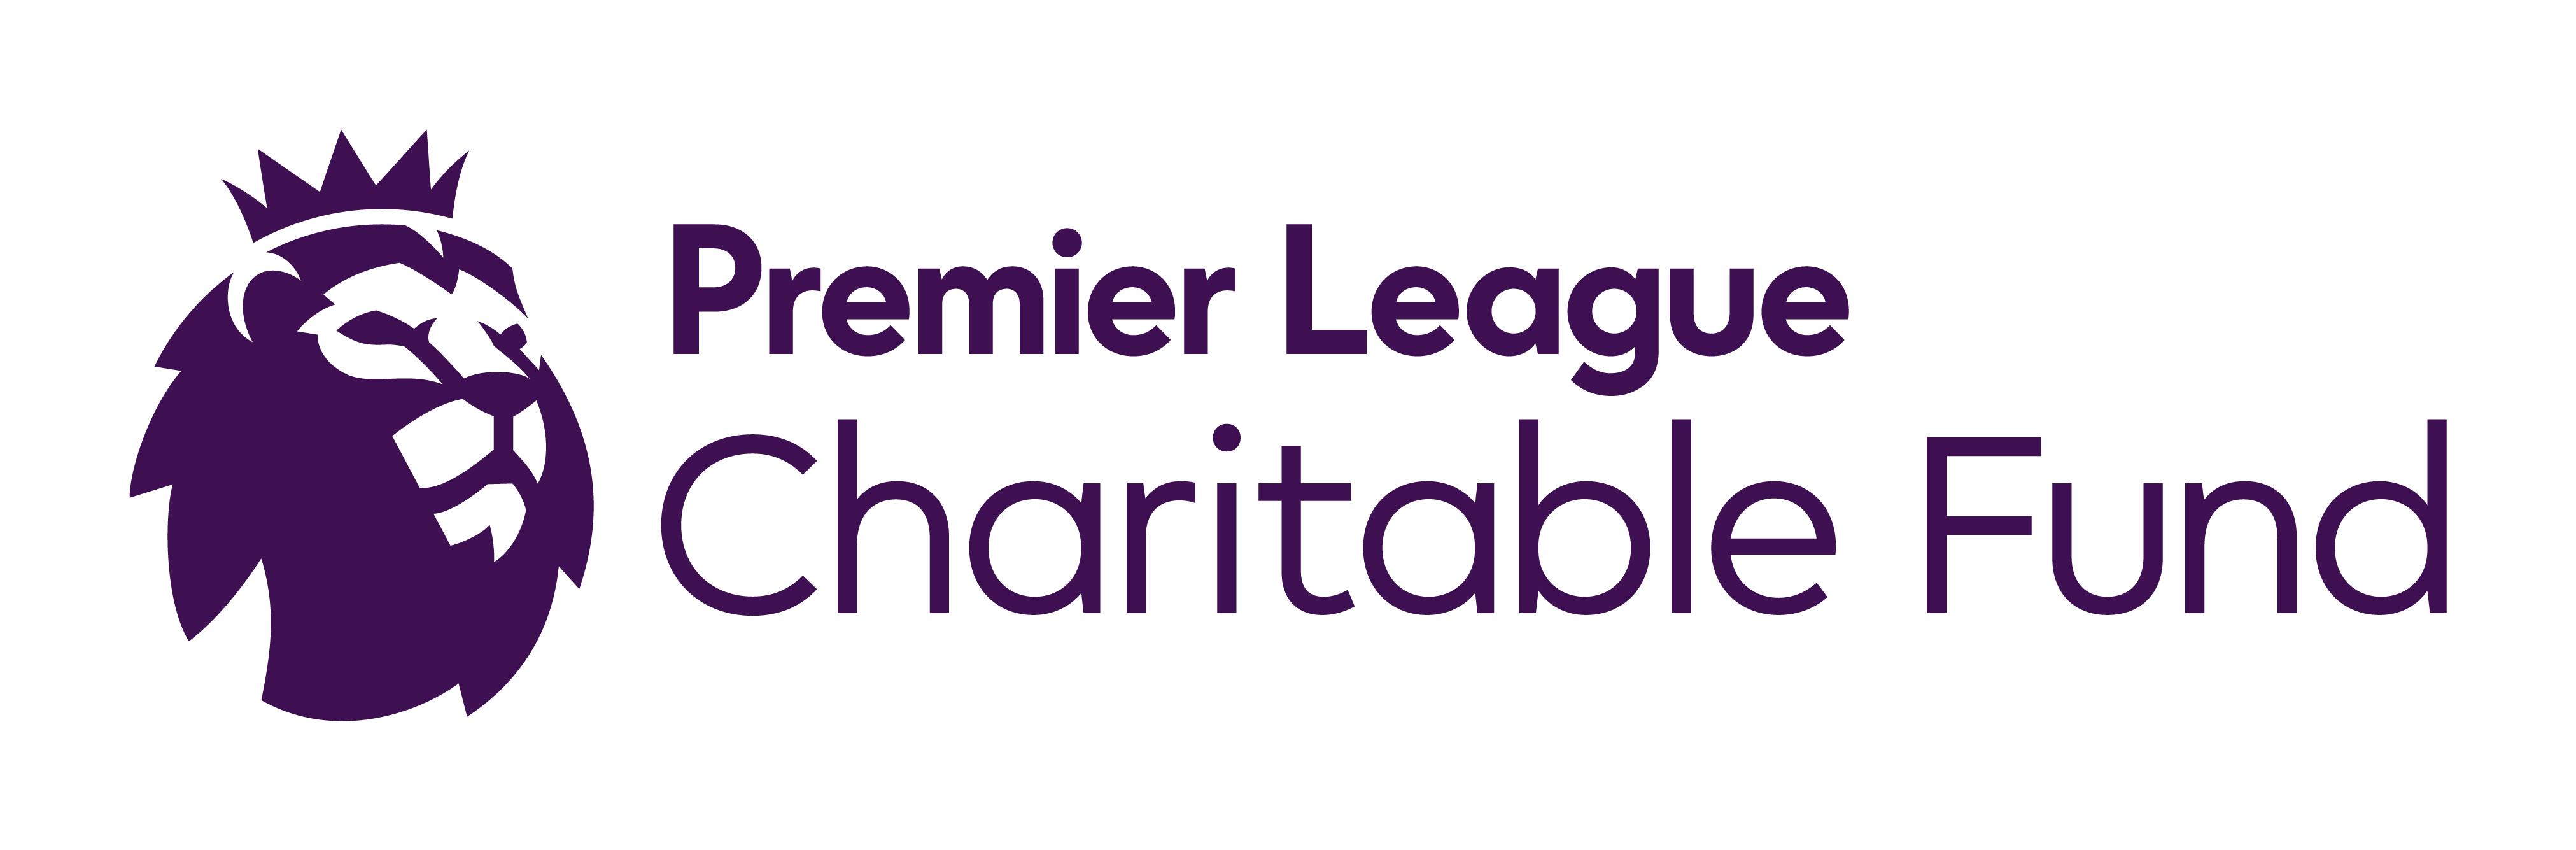 Logo for Premier League Charitable Fund